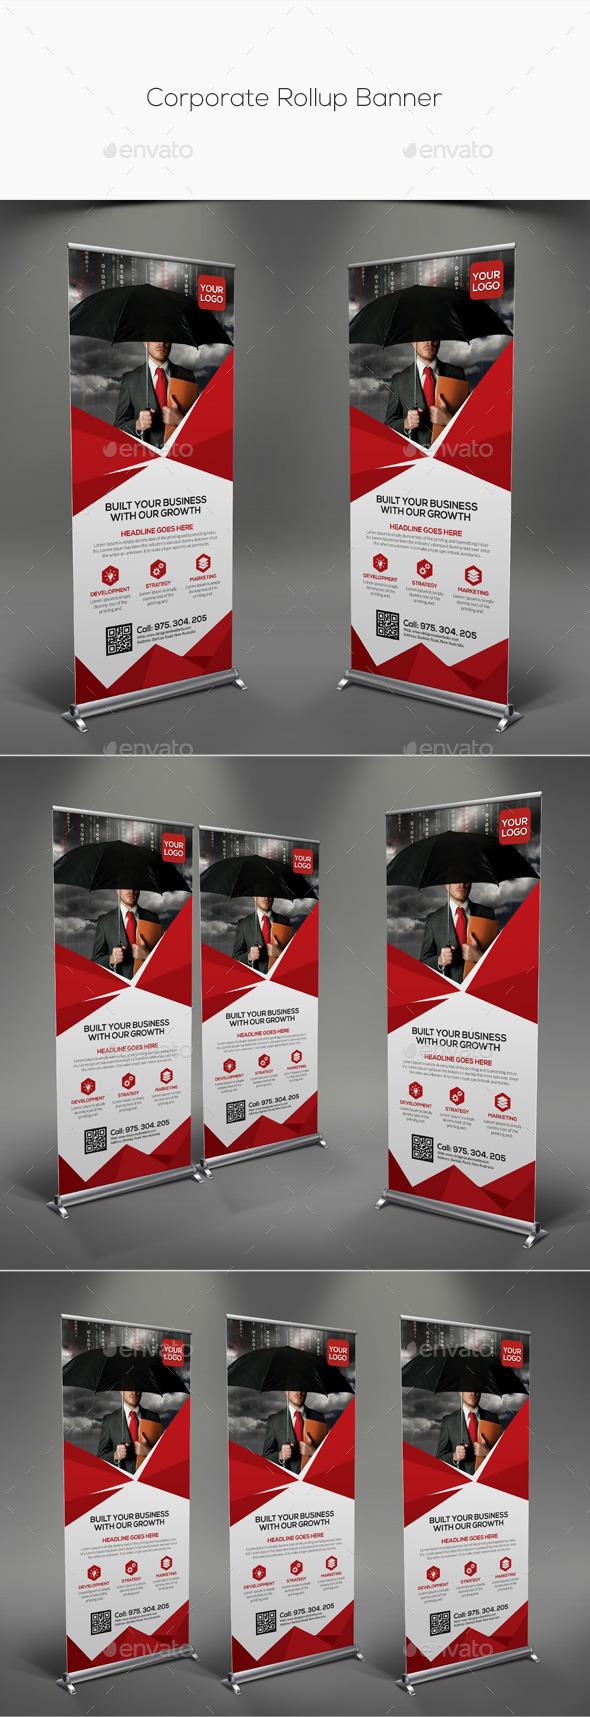 GraphicRiver Corporate Rollup Banner 11324232